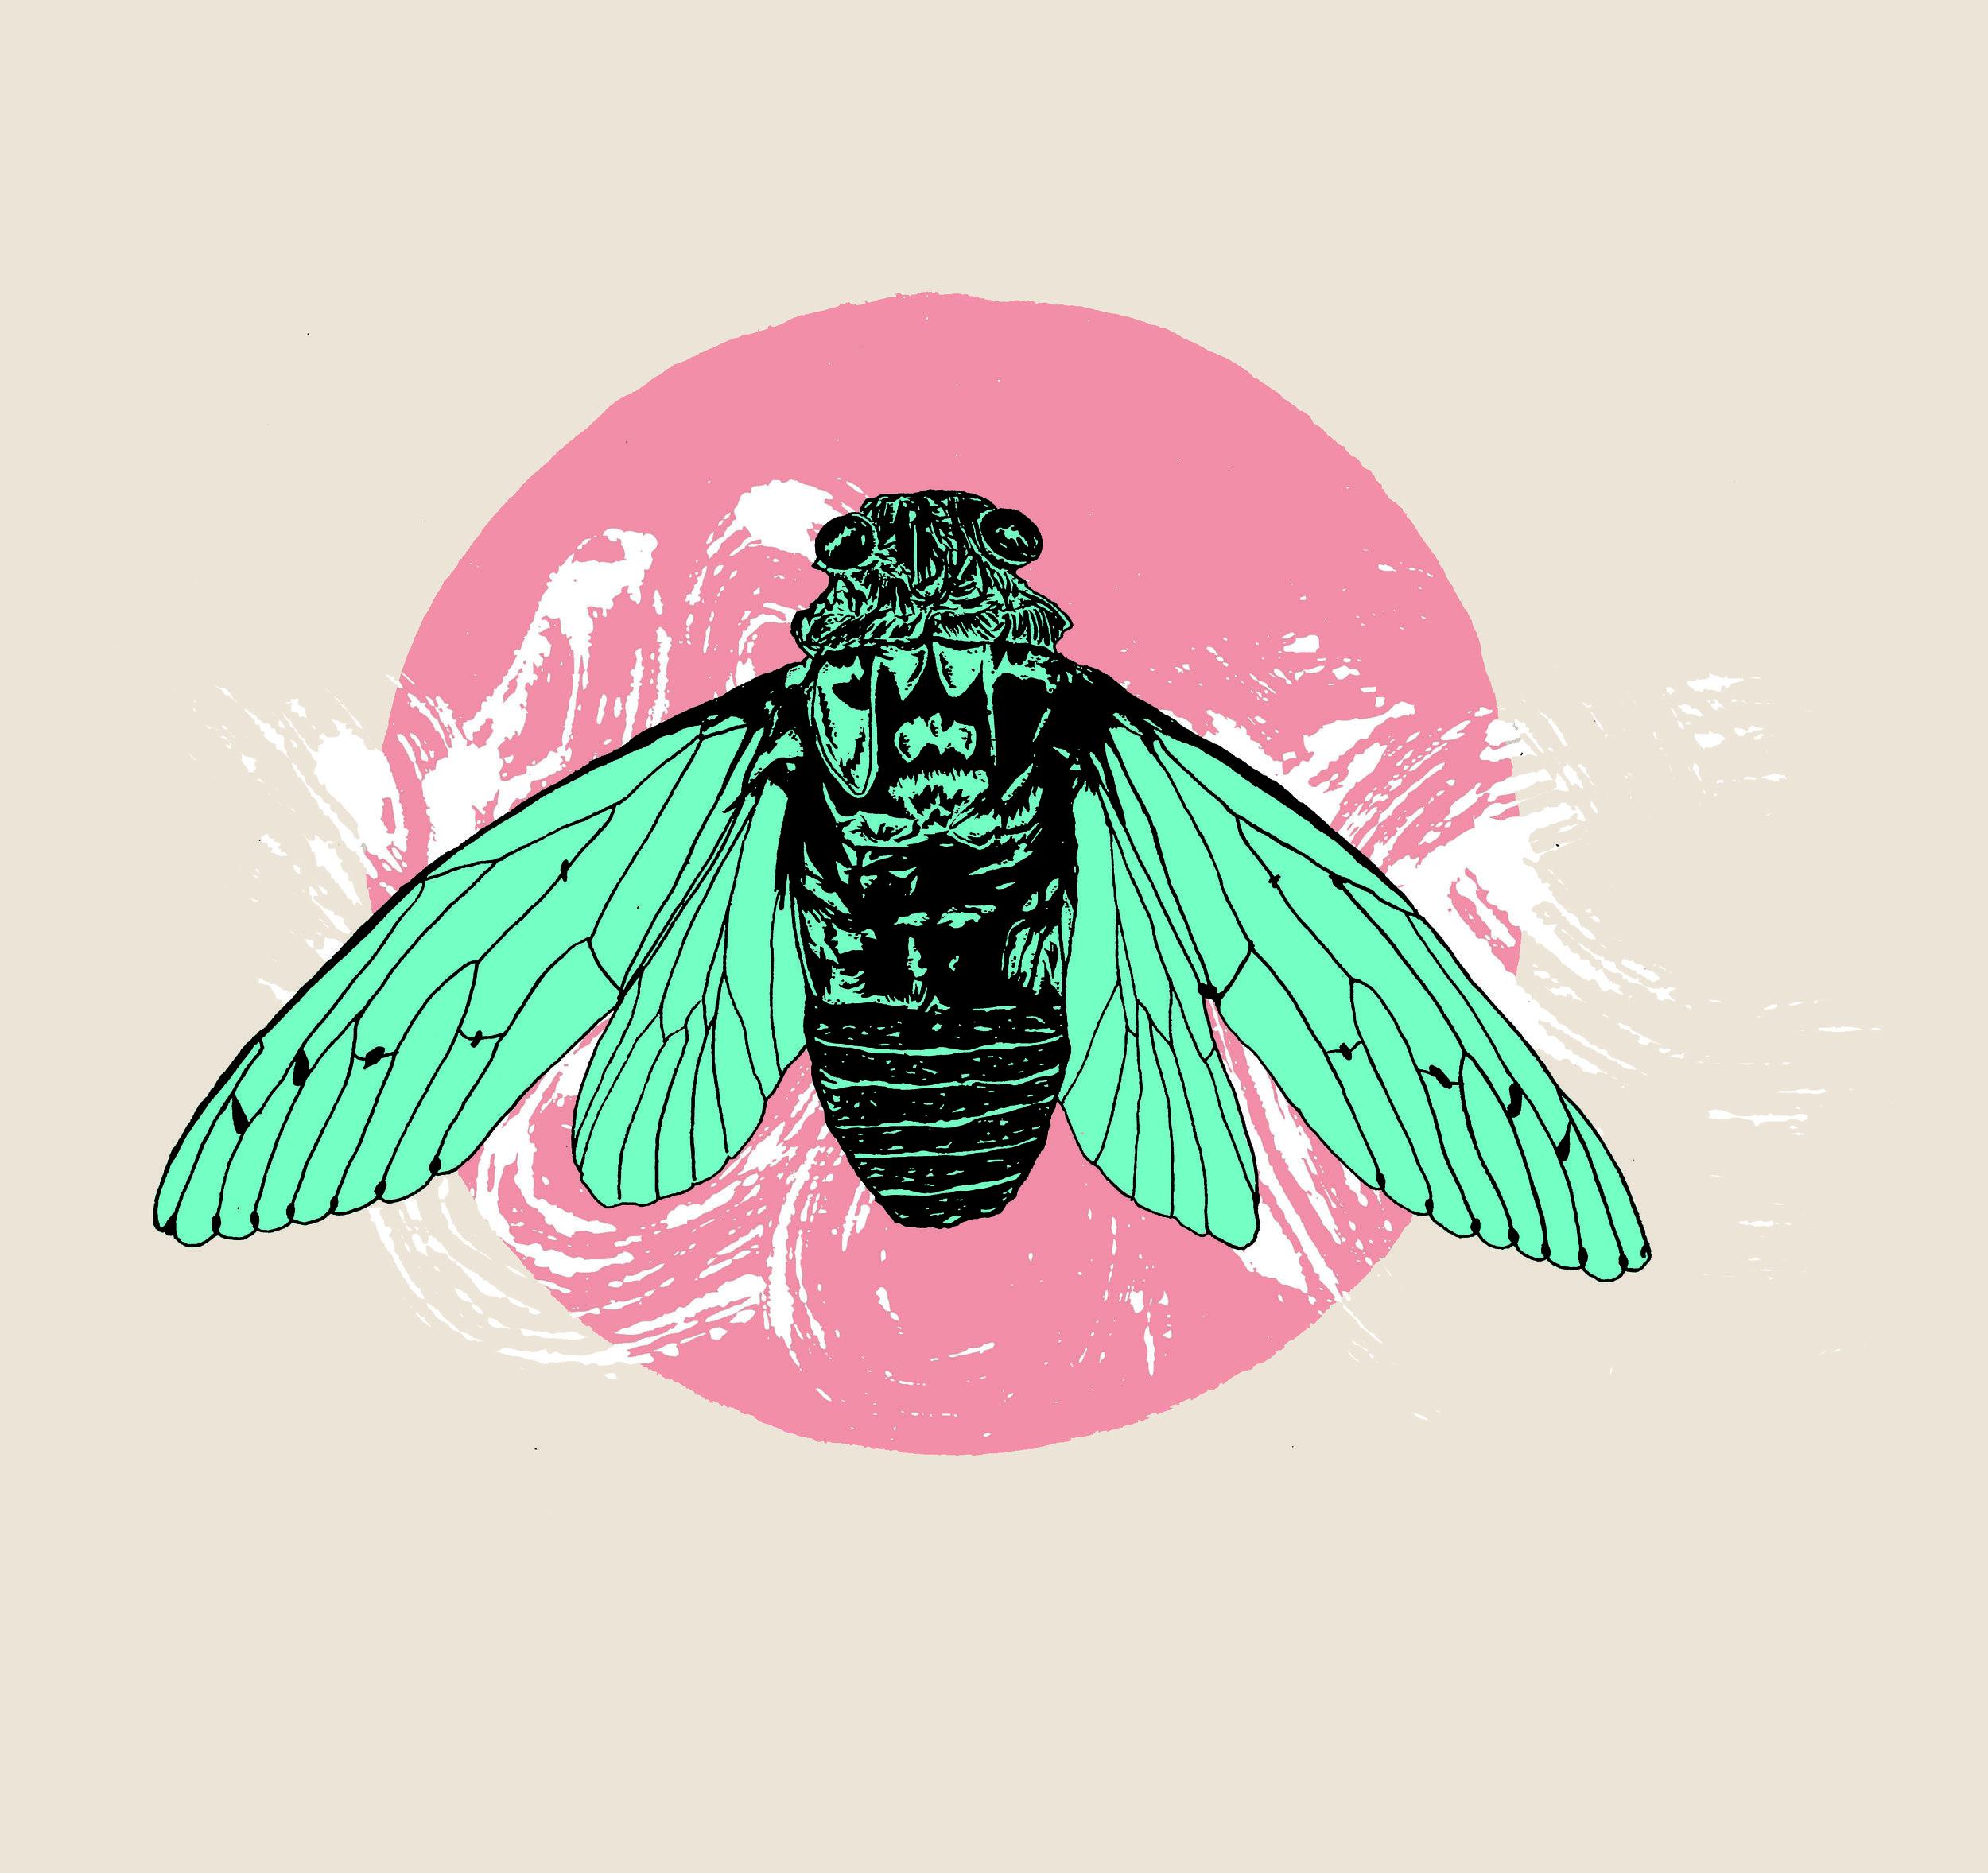 cicada shirt design2.jpg